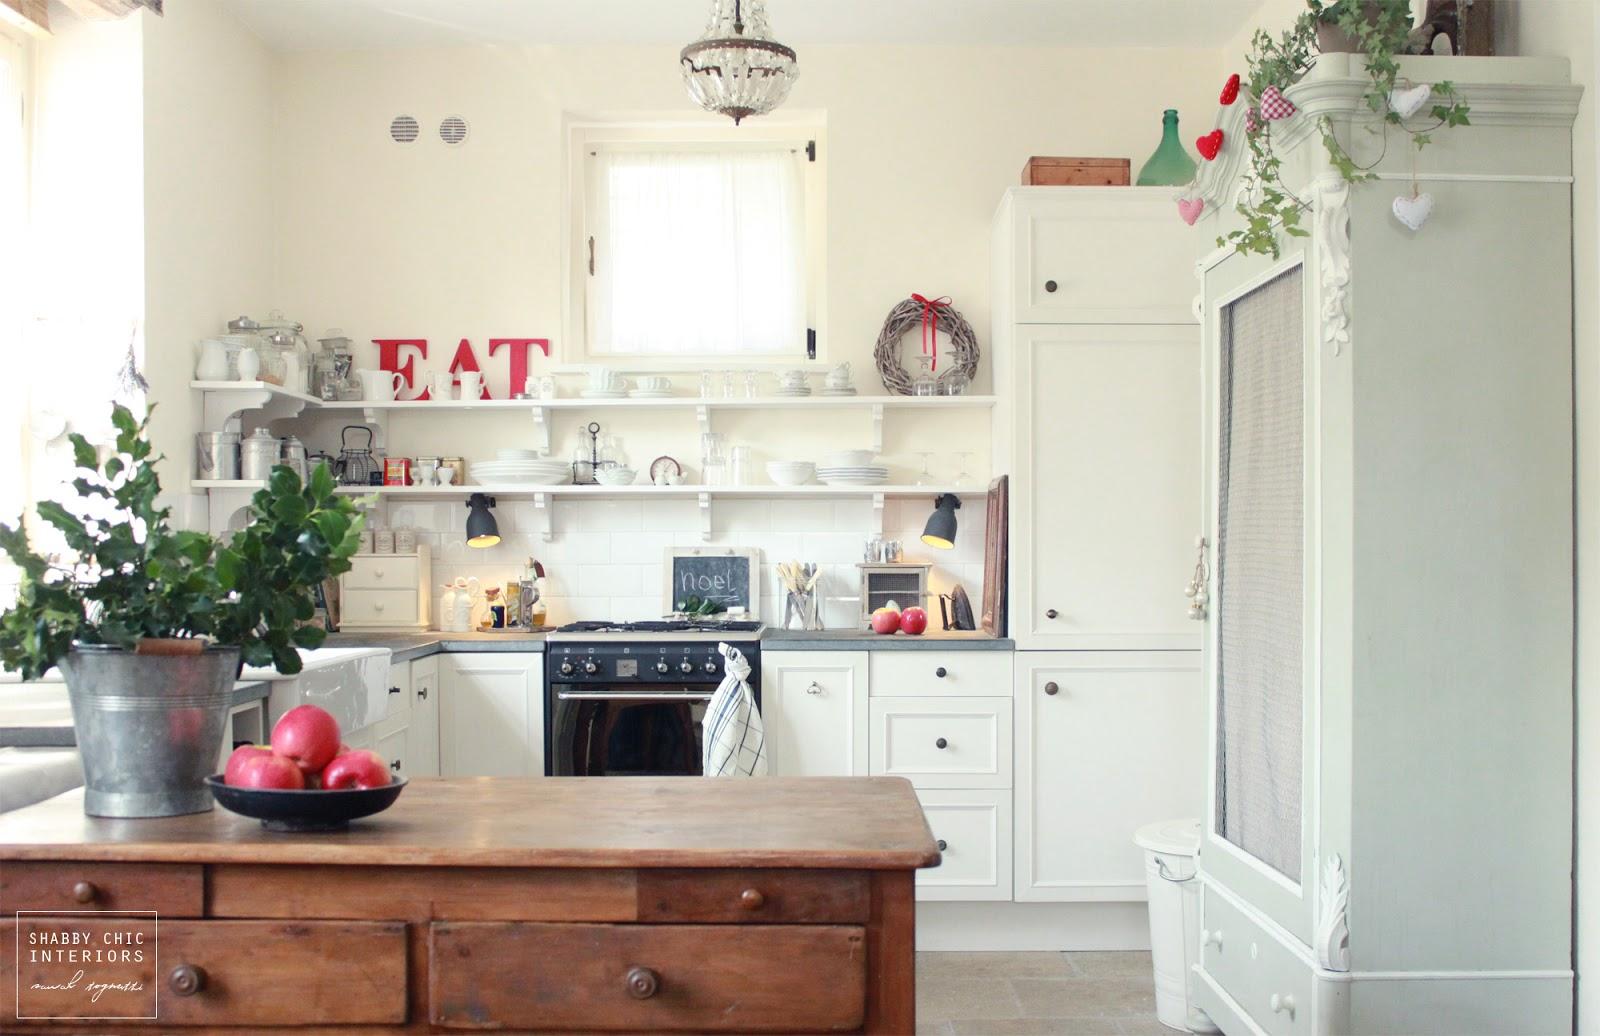 Shabby Chic Natale : Natale in famiglia shabby chic interiors